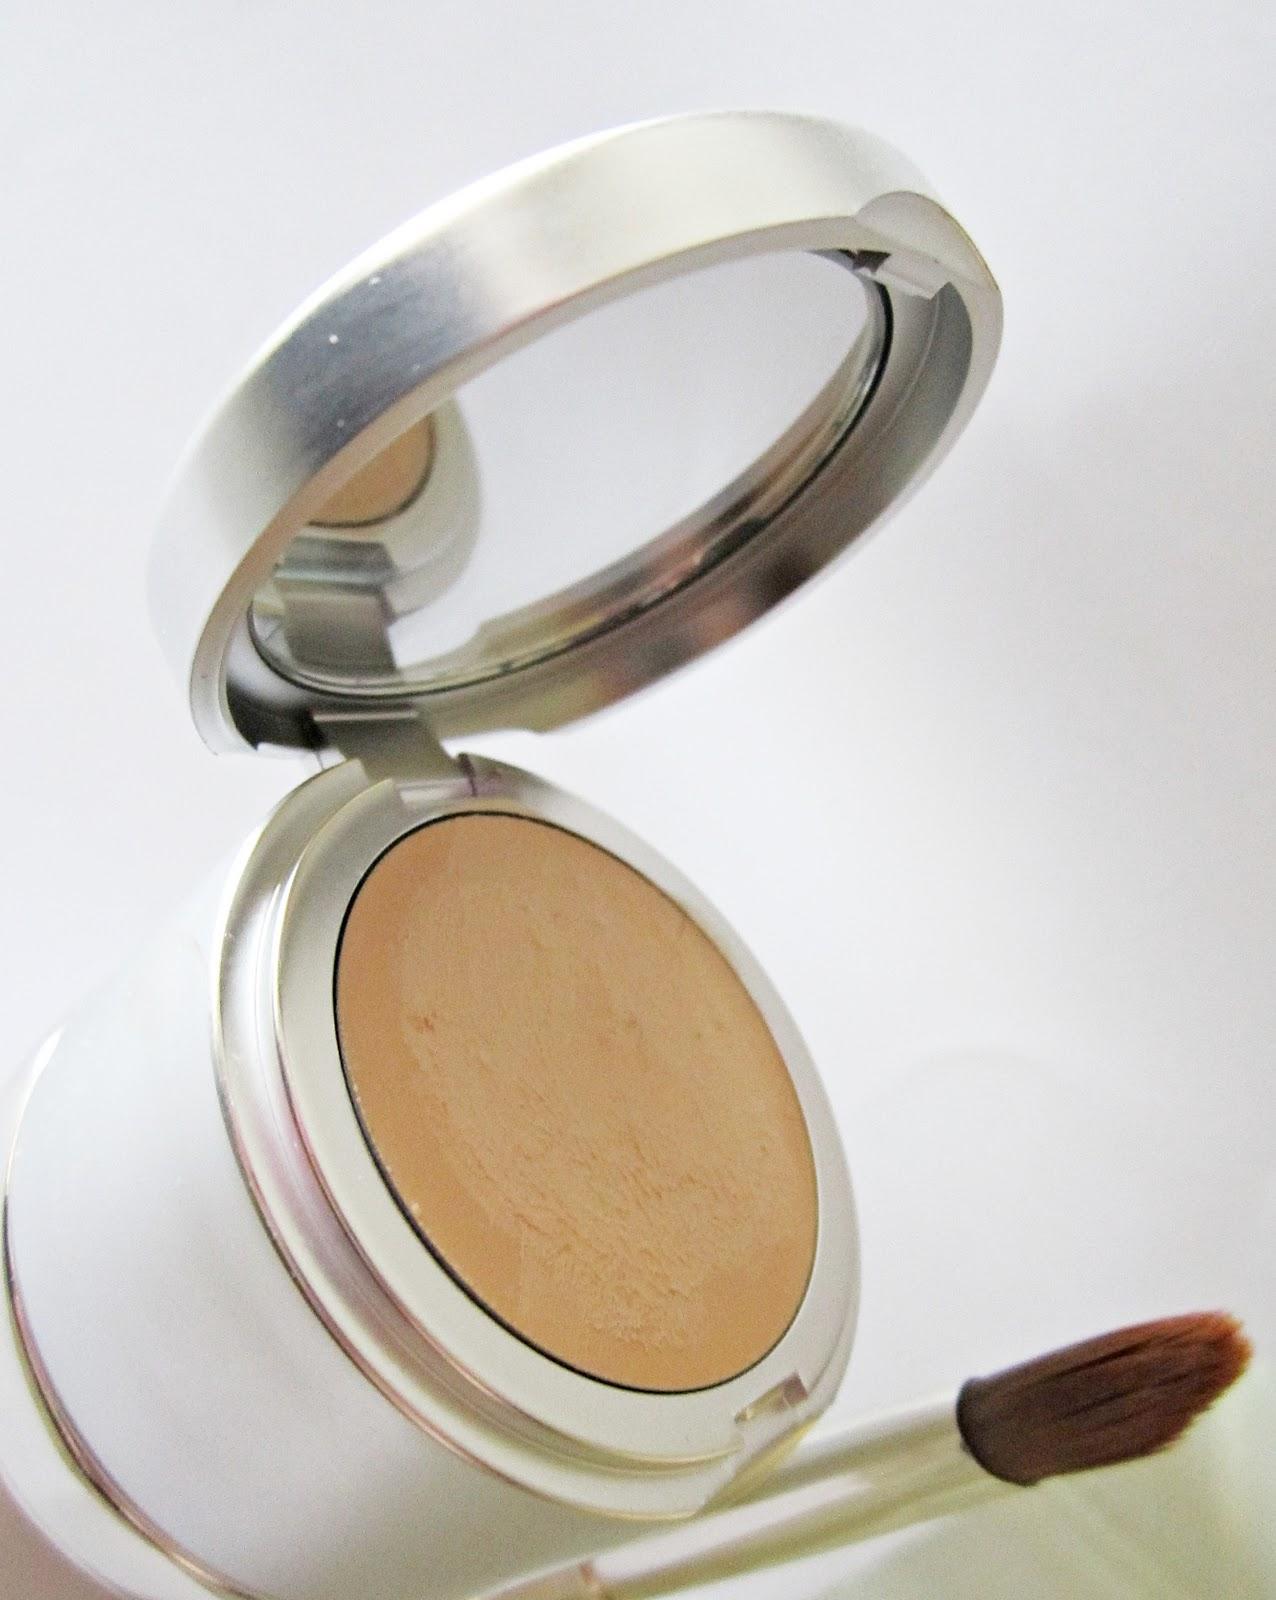 Time Control Concealer Makeup